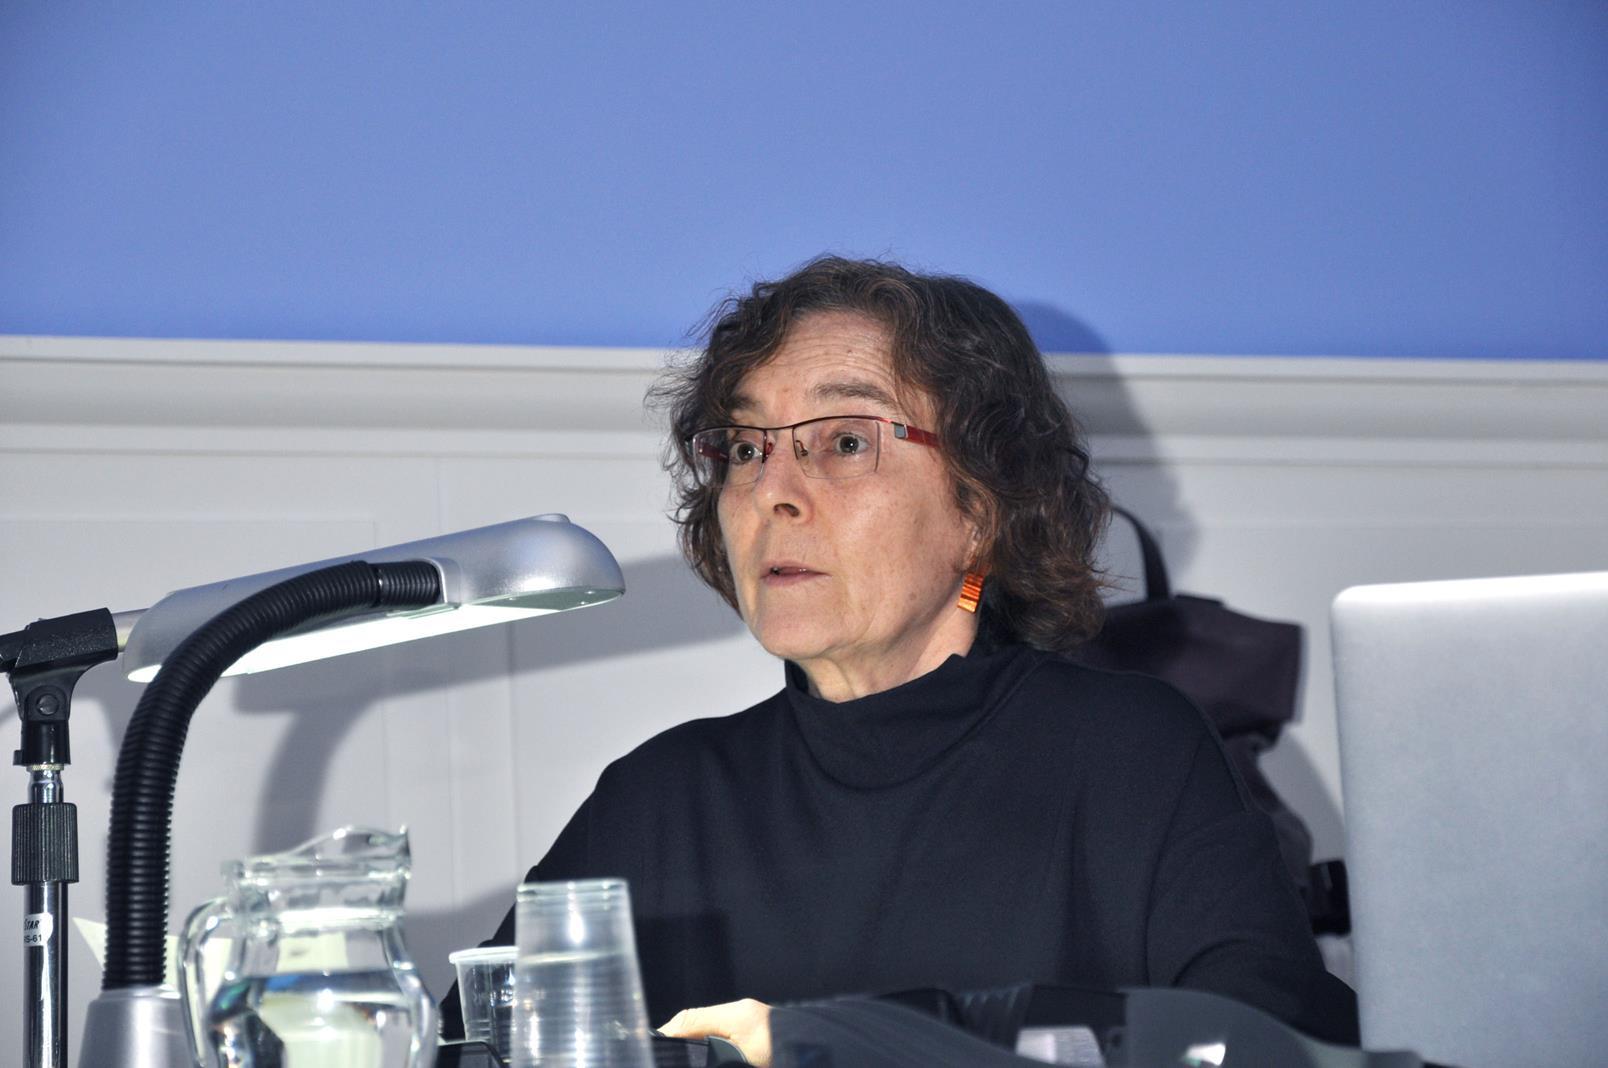 Maite Iranzo. Directora AHP, Zaragoza. 24/10/19